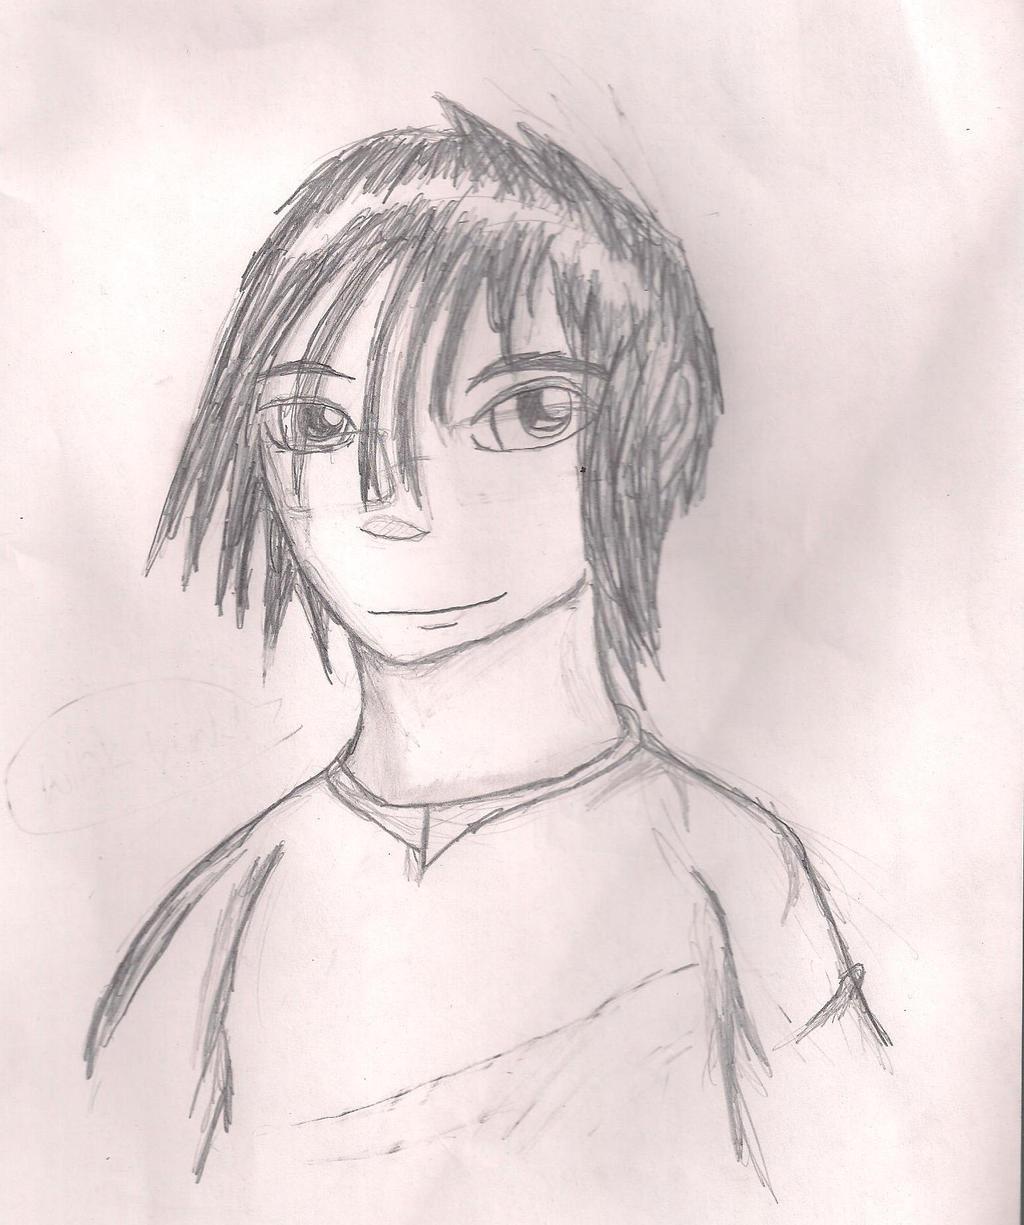 Anime guy?